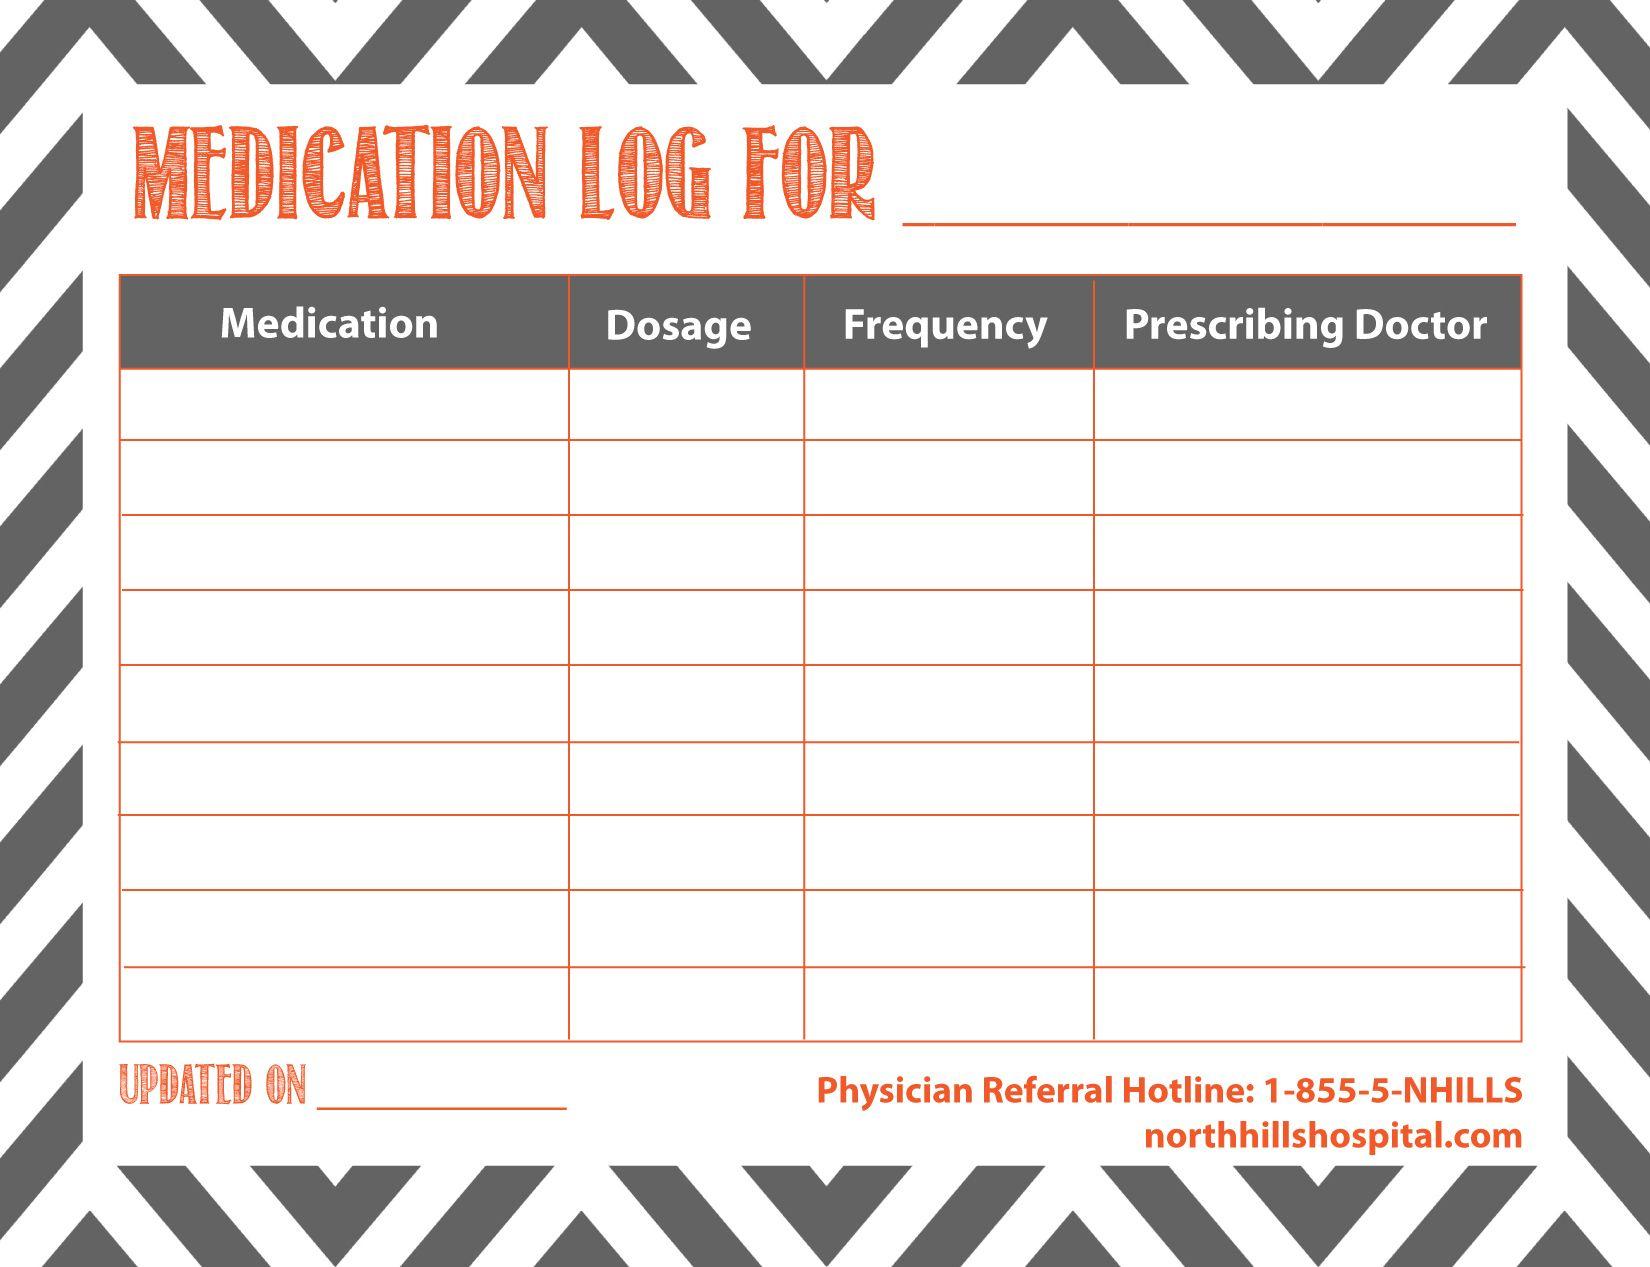 Free Printable: Medication Log | Planner Ideas & Printables - Free Printable Medication Log